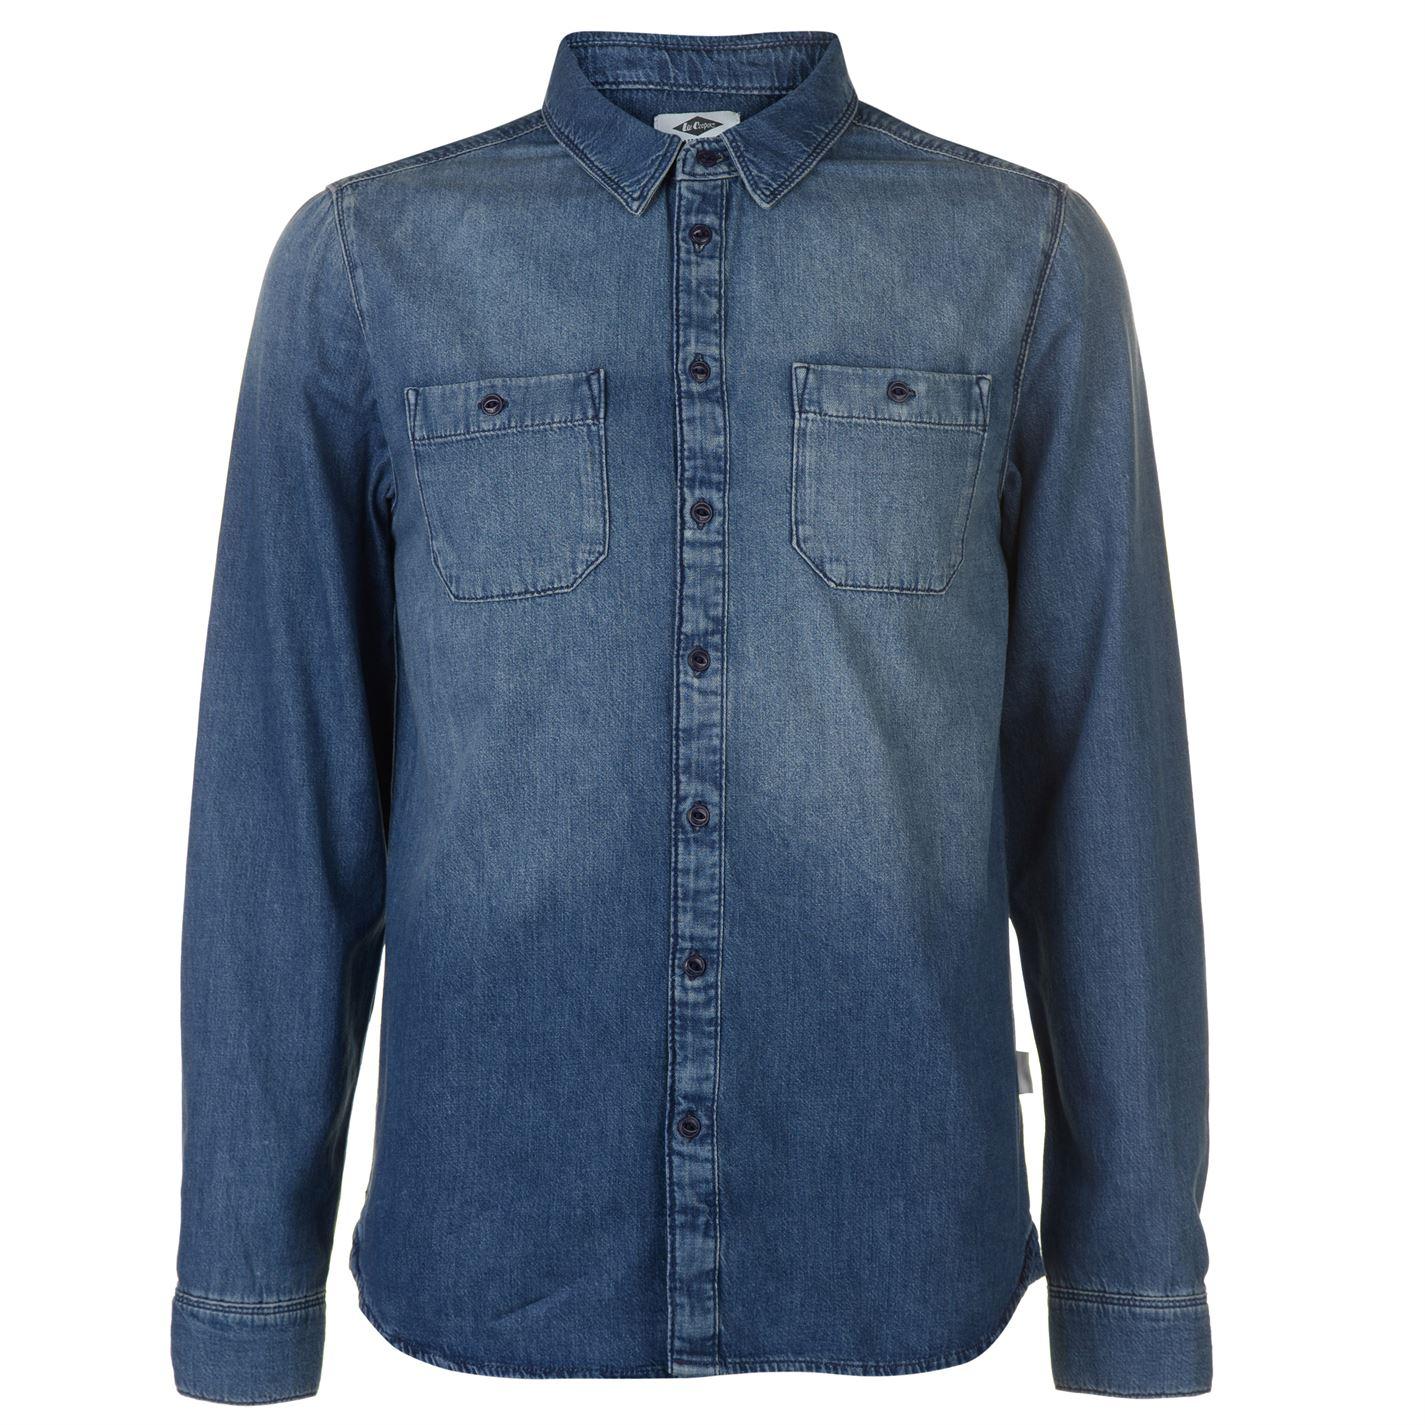 Lee Cooper Chambray Shirt